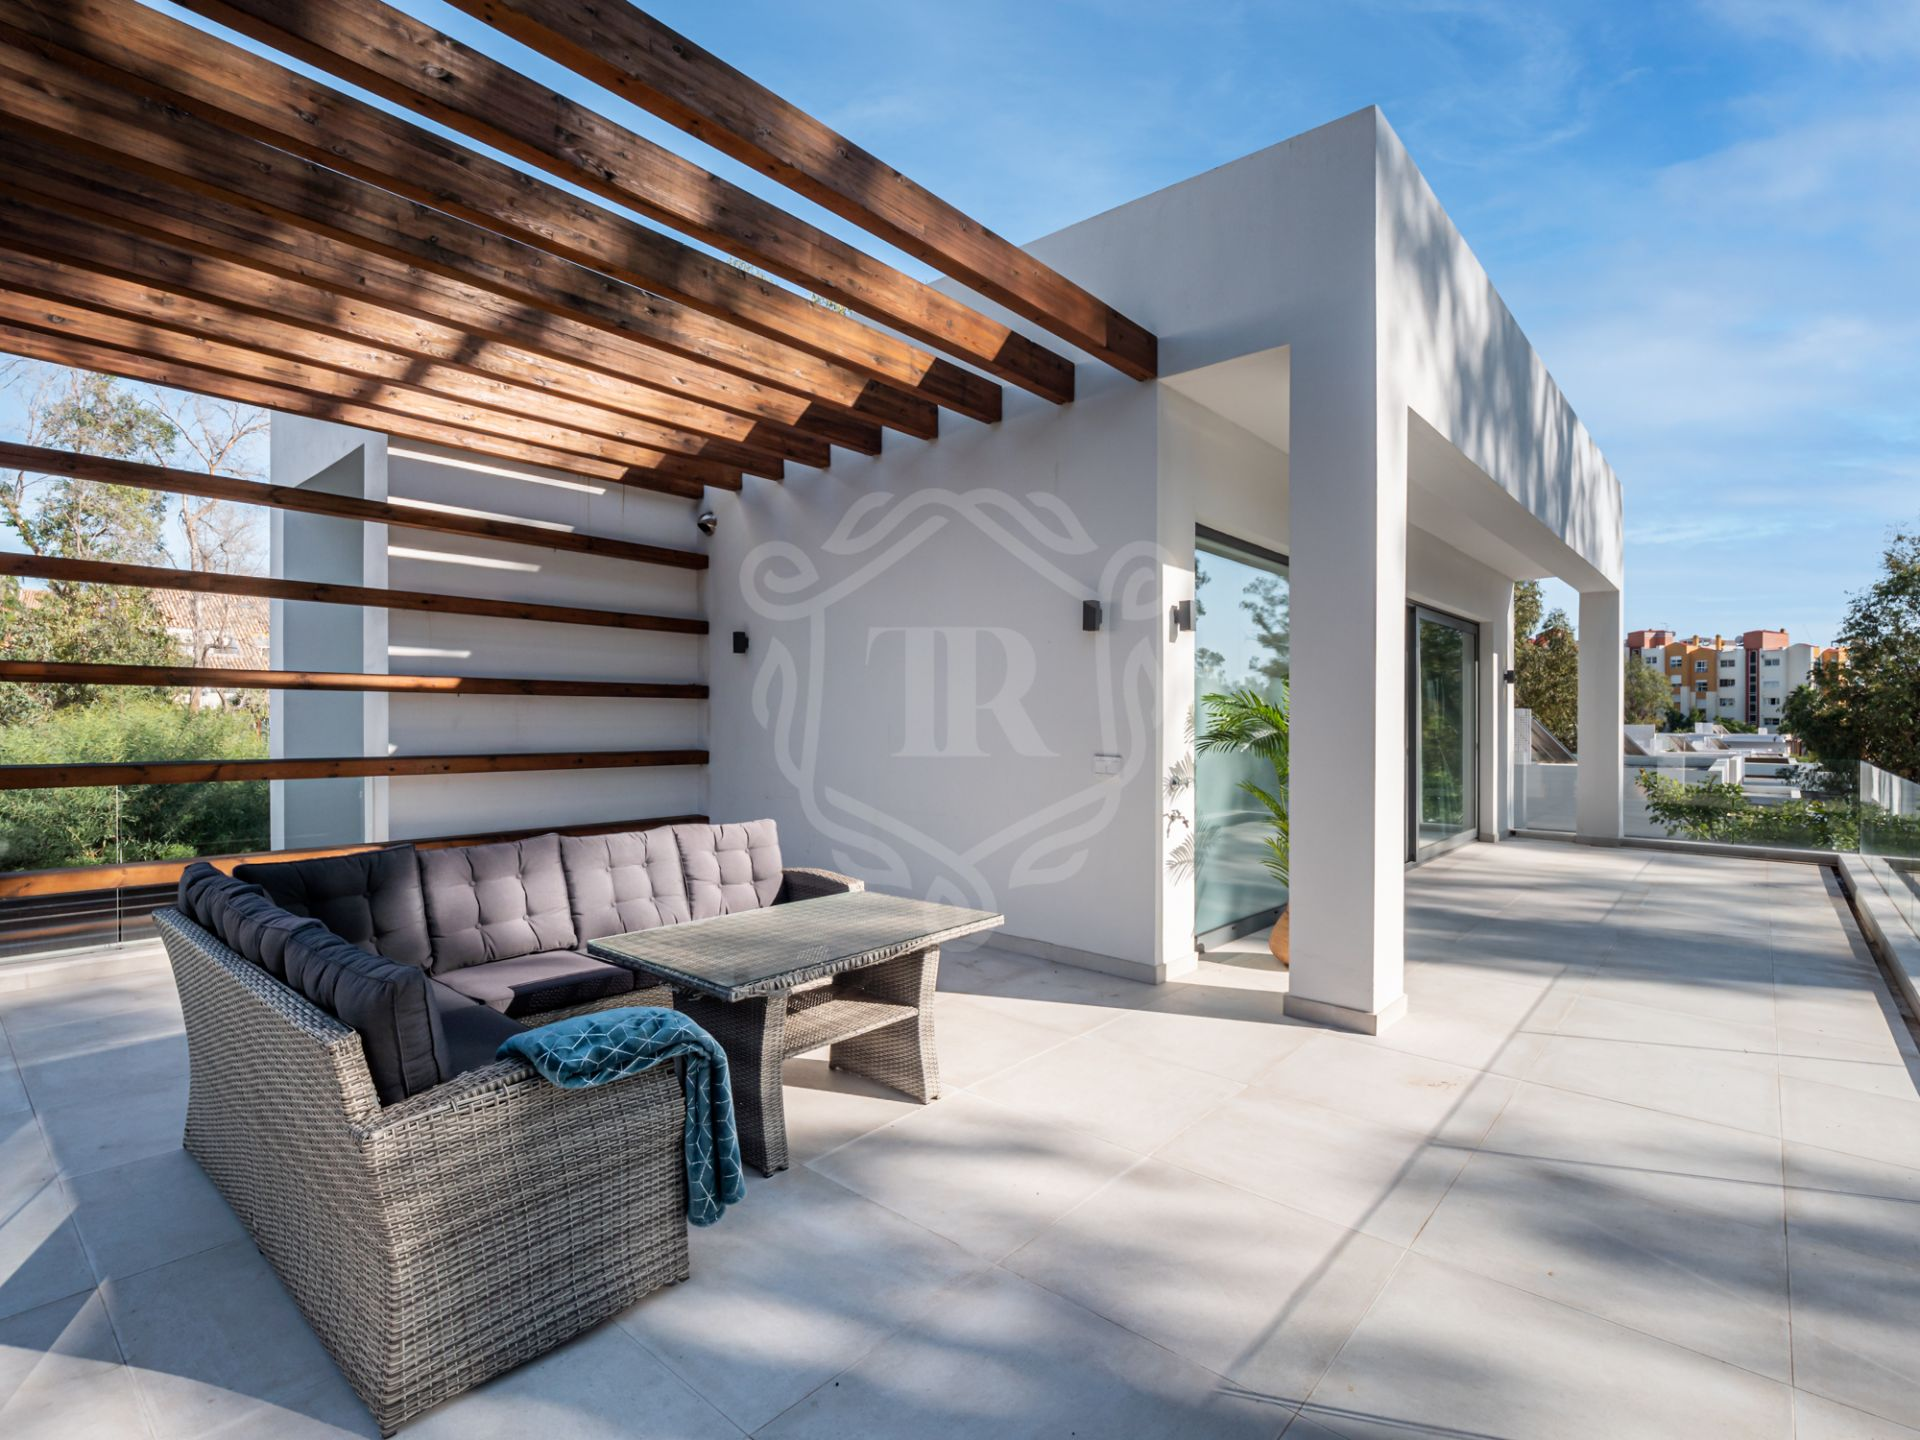 Villa for sale in Arboleda, Estepona